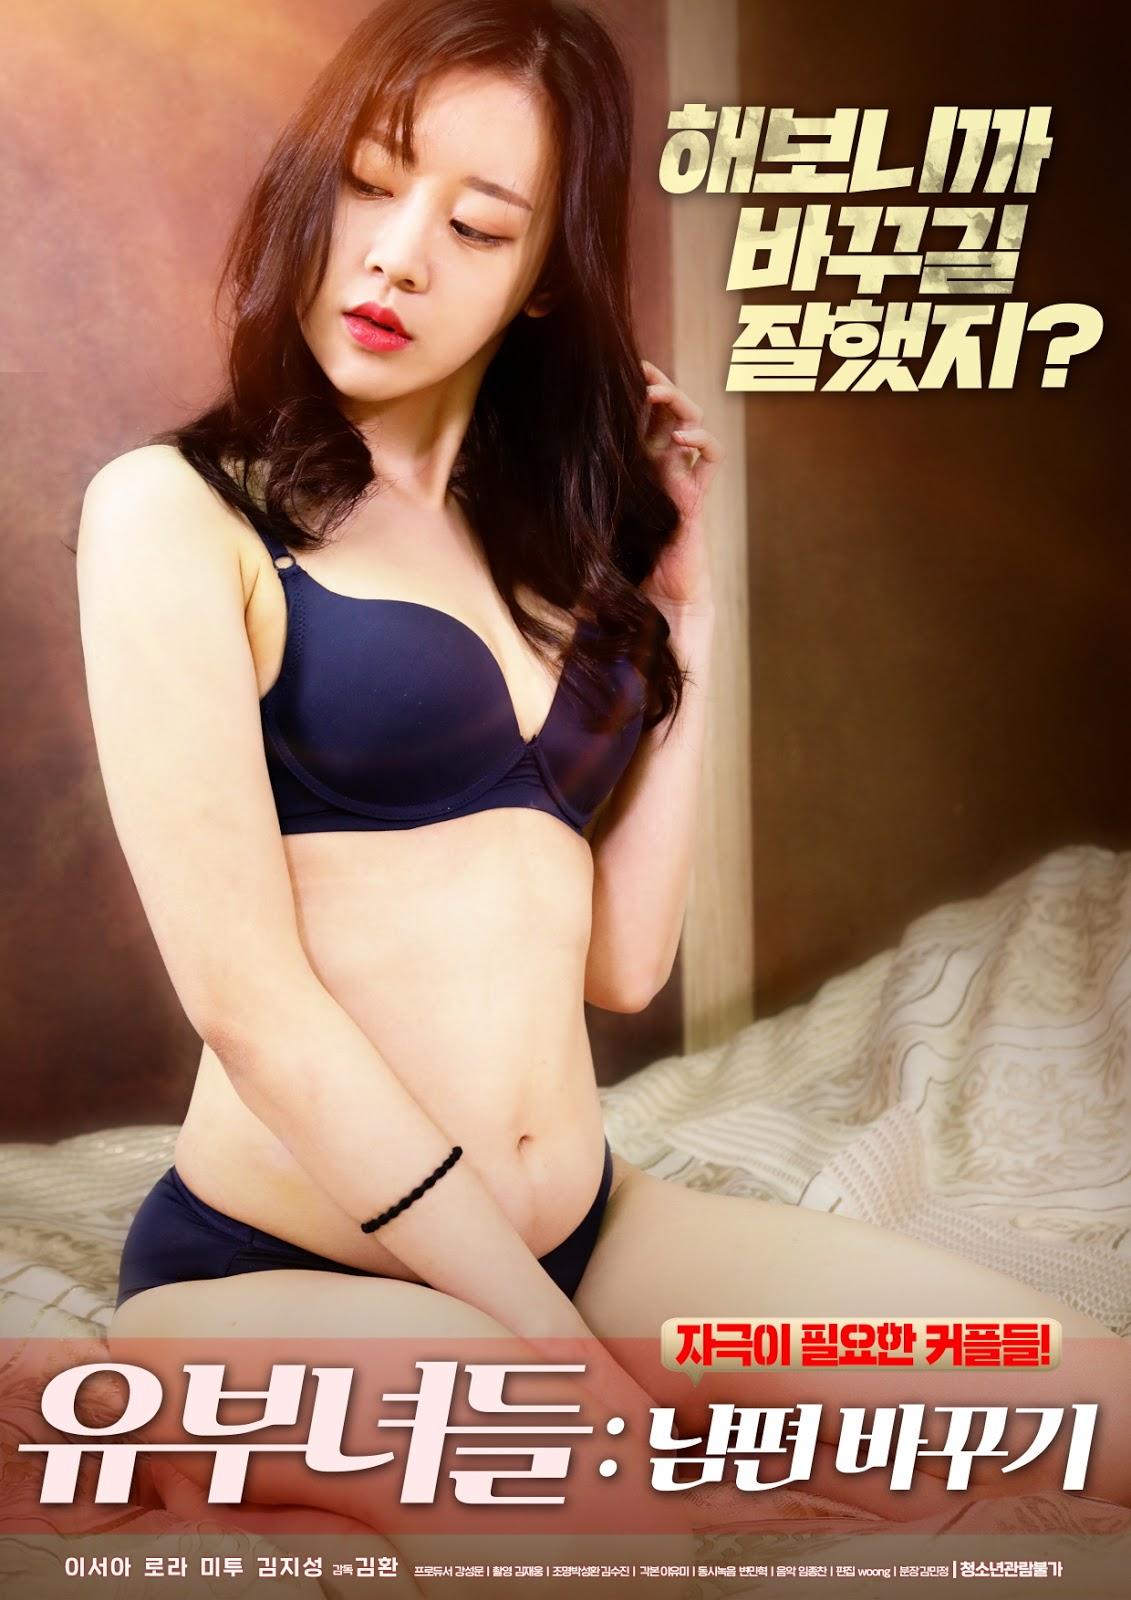 Married Women Changing Husband Full Korea 18+ Adult Movie Online Free